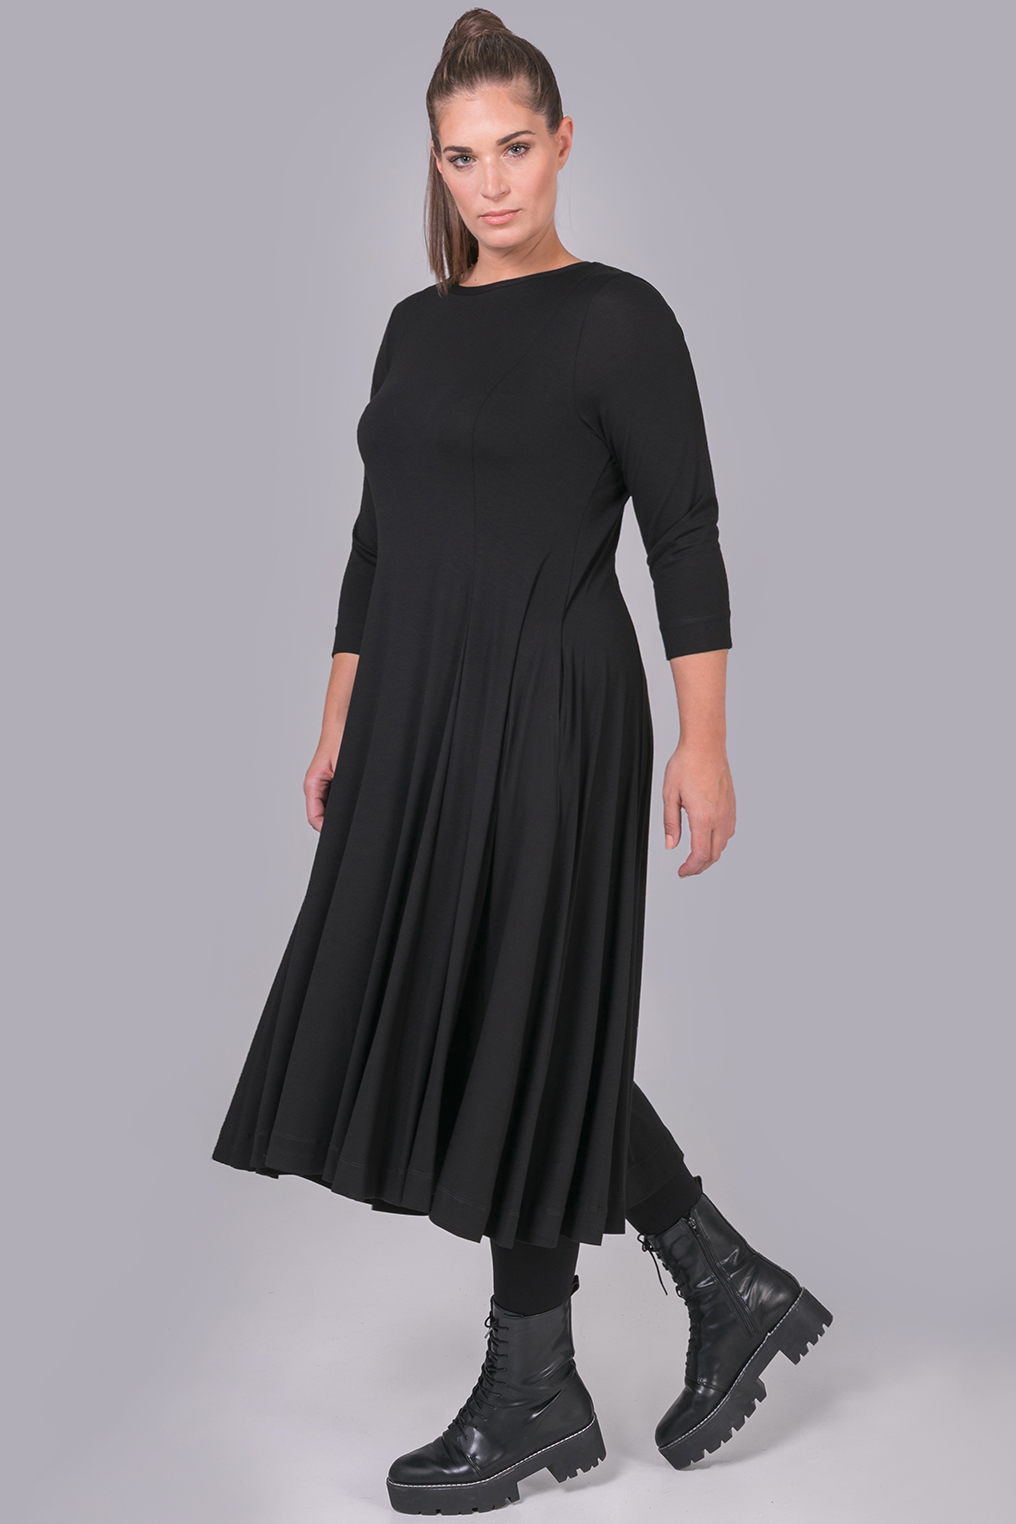 Mat Fashion jurk klokkend